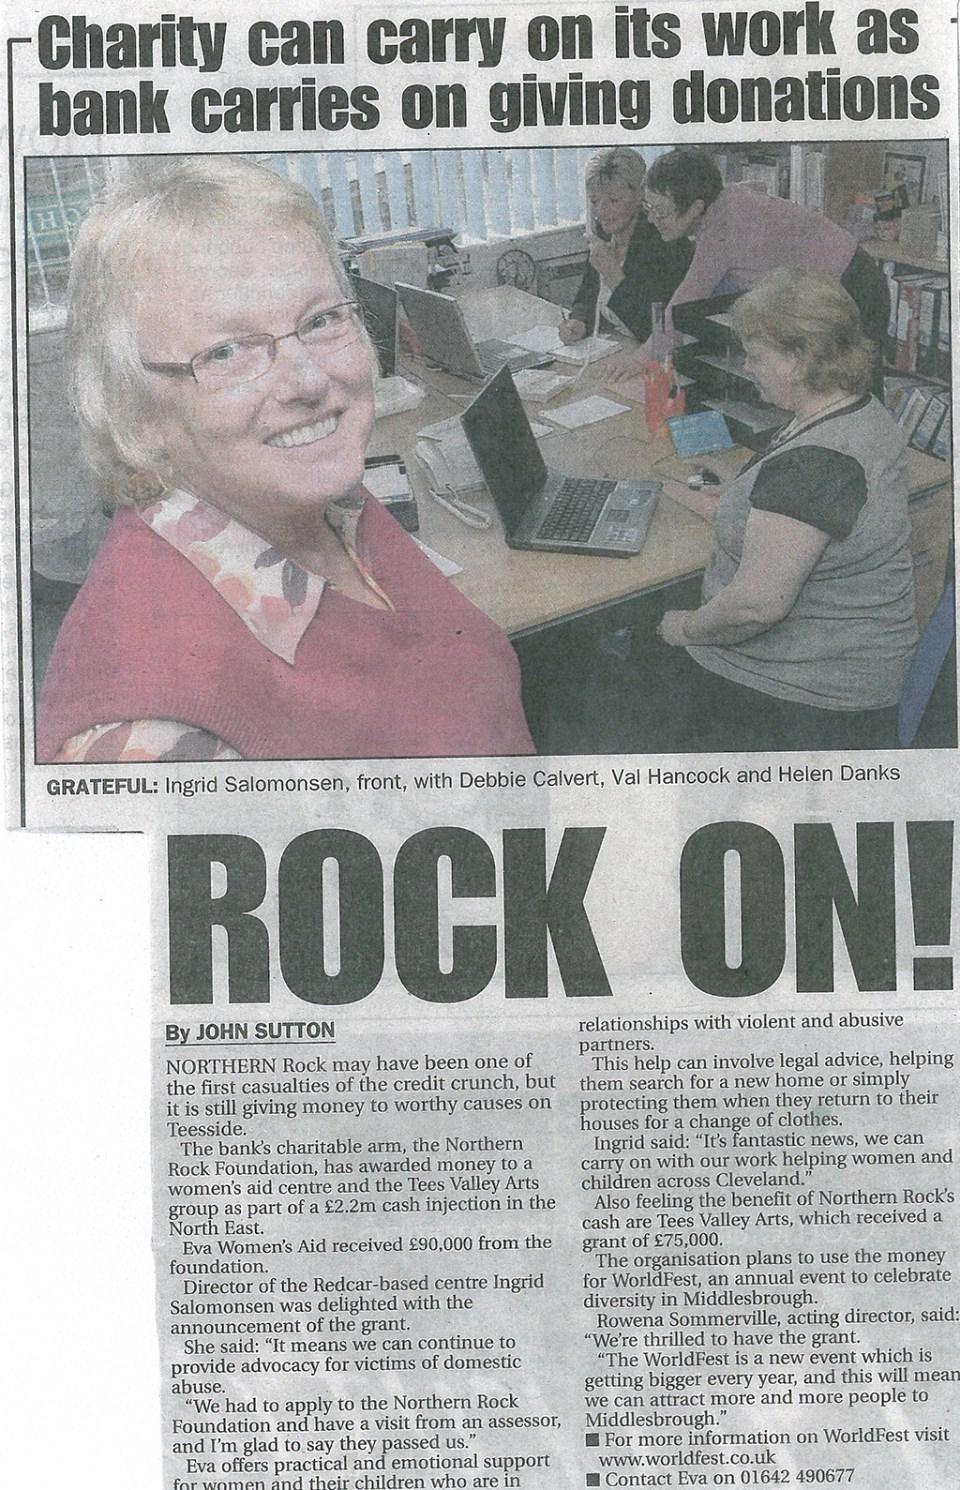 2008-10-22, Evening Gazette